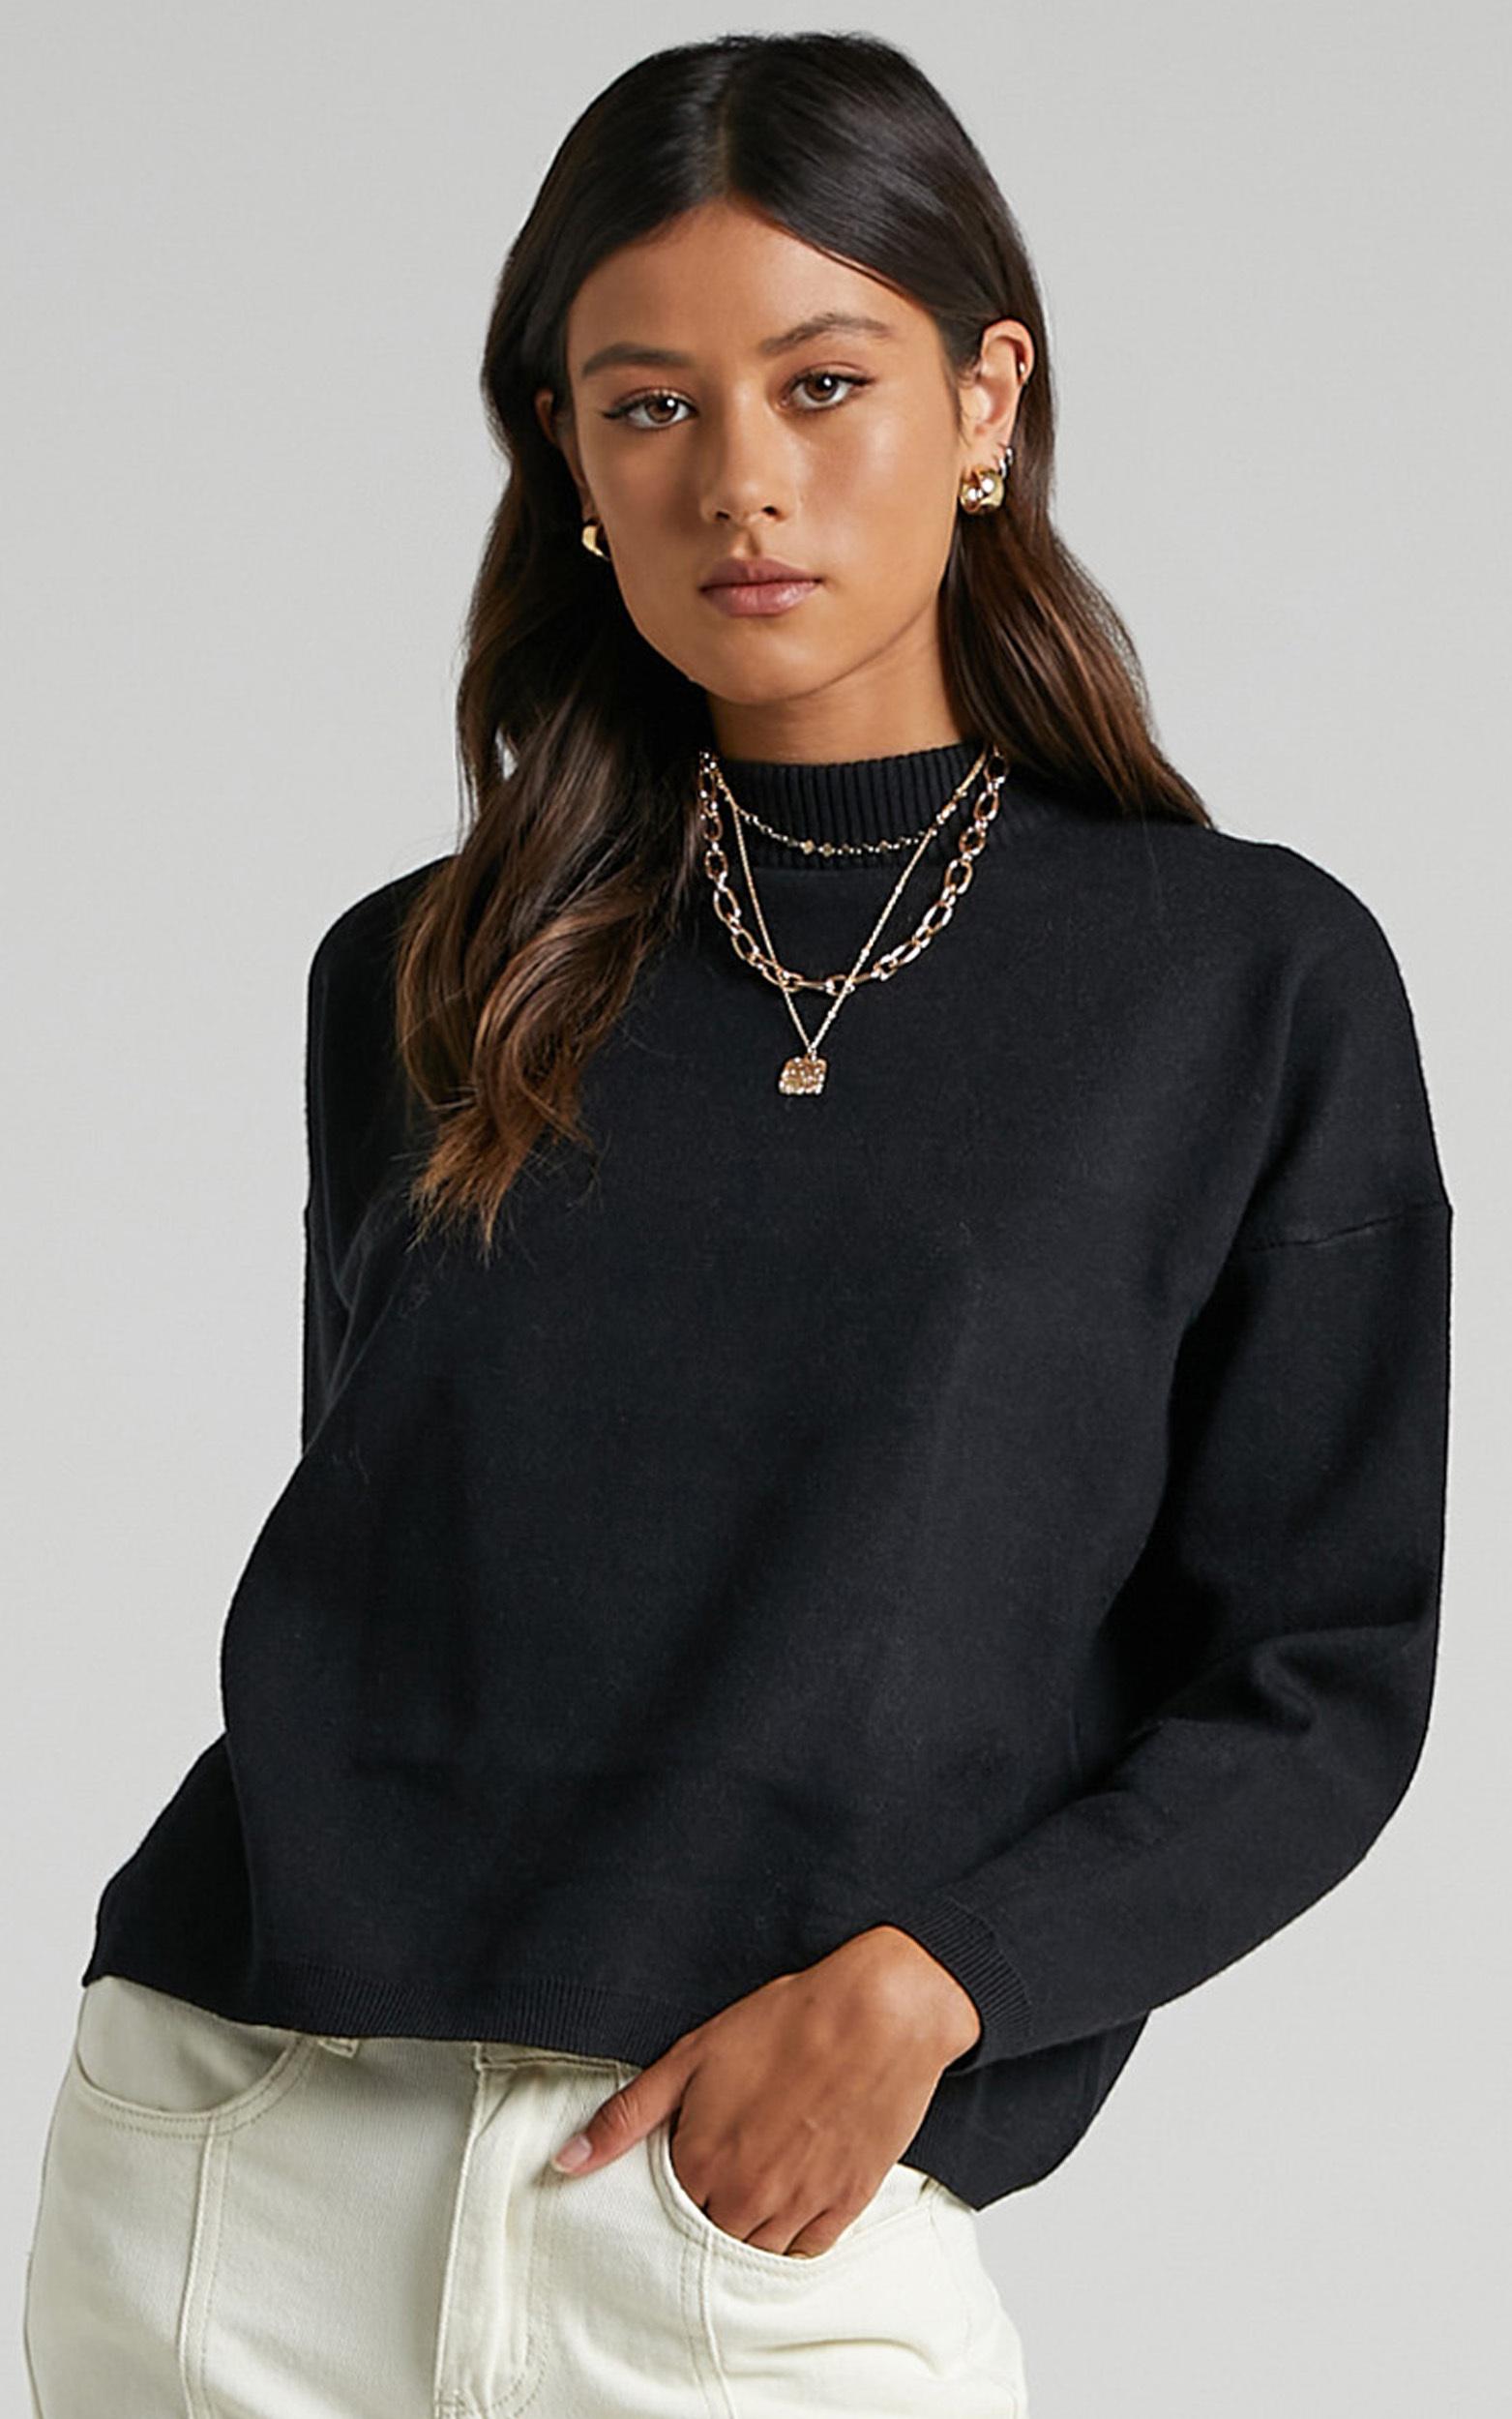 Midnight Glow Knit Jumper in Black - 12 (L), Black, hi-res image number null